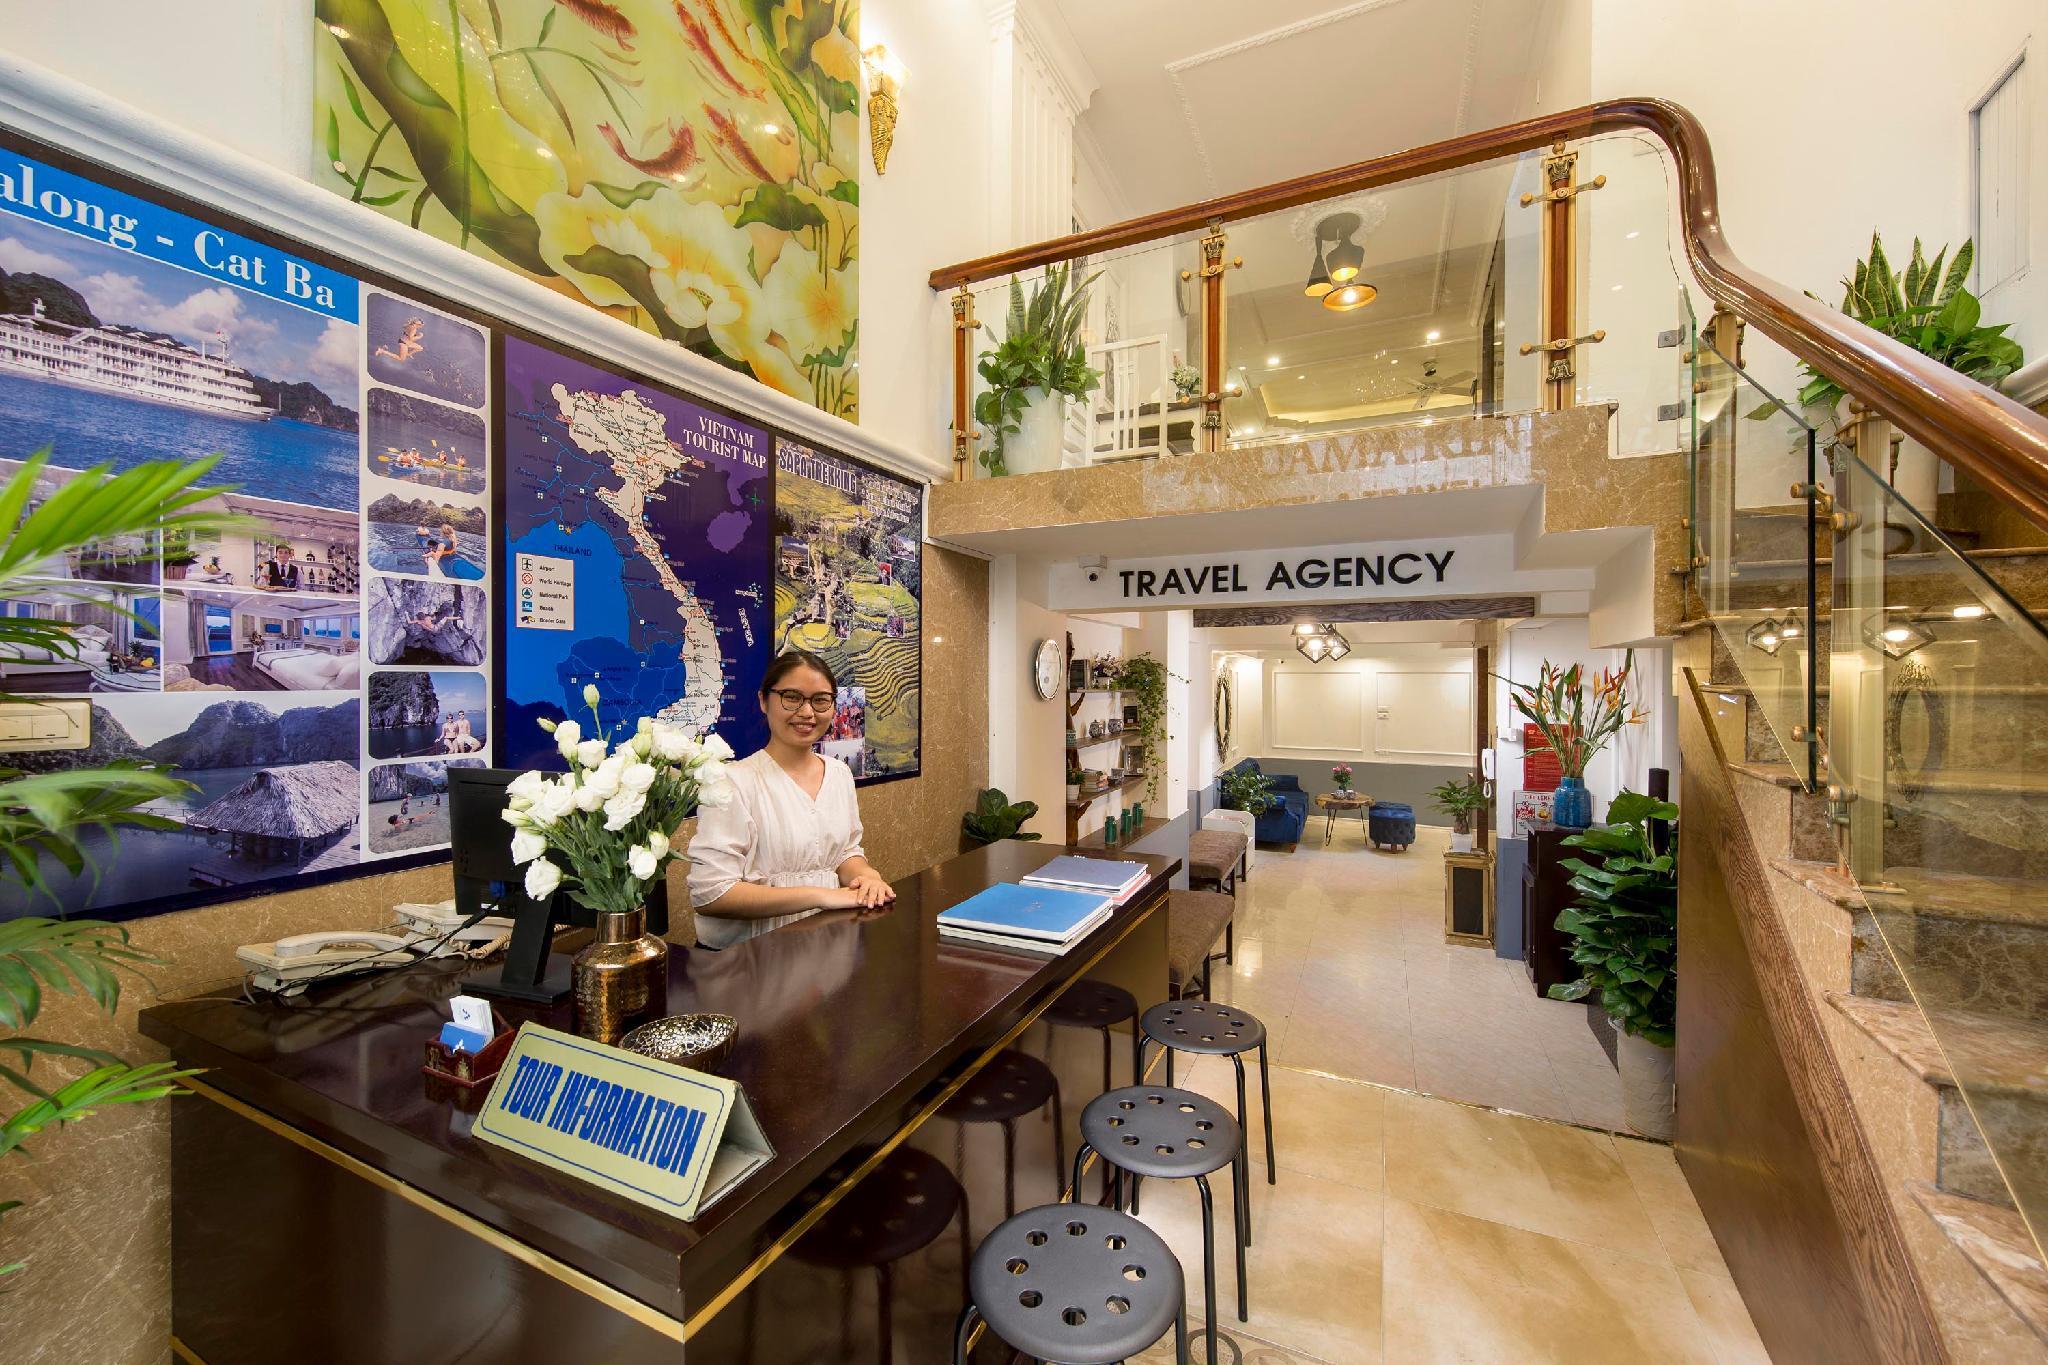 Aquamarine Hotel And Travel